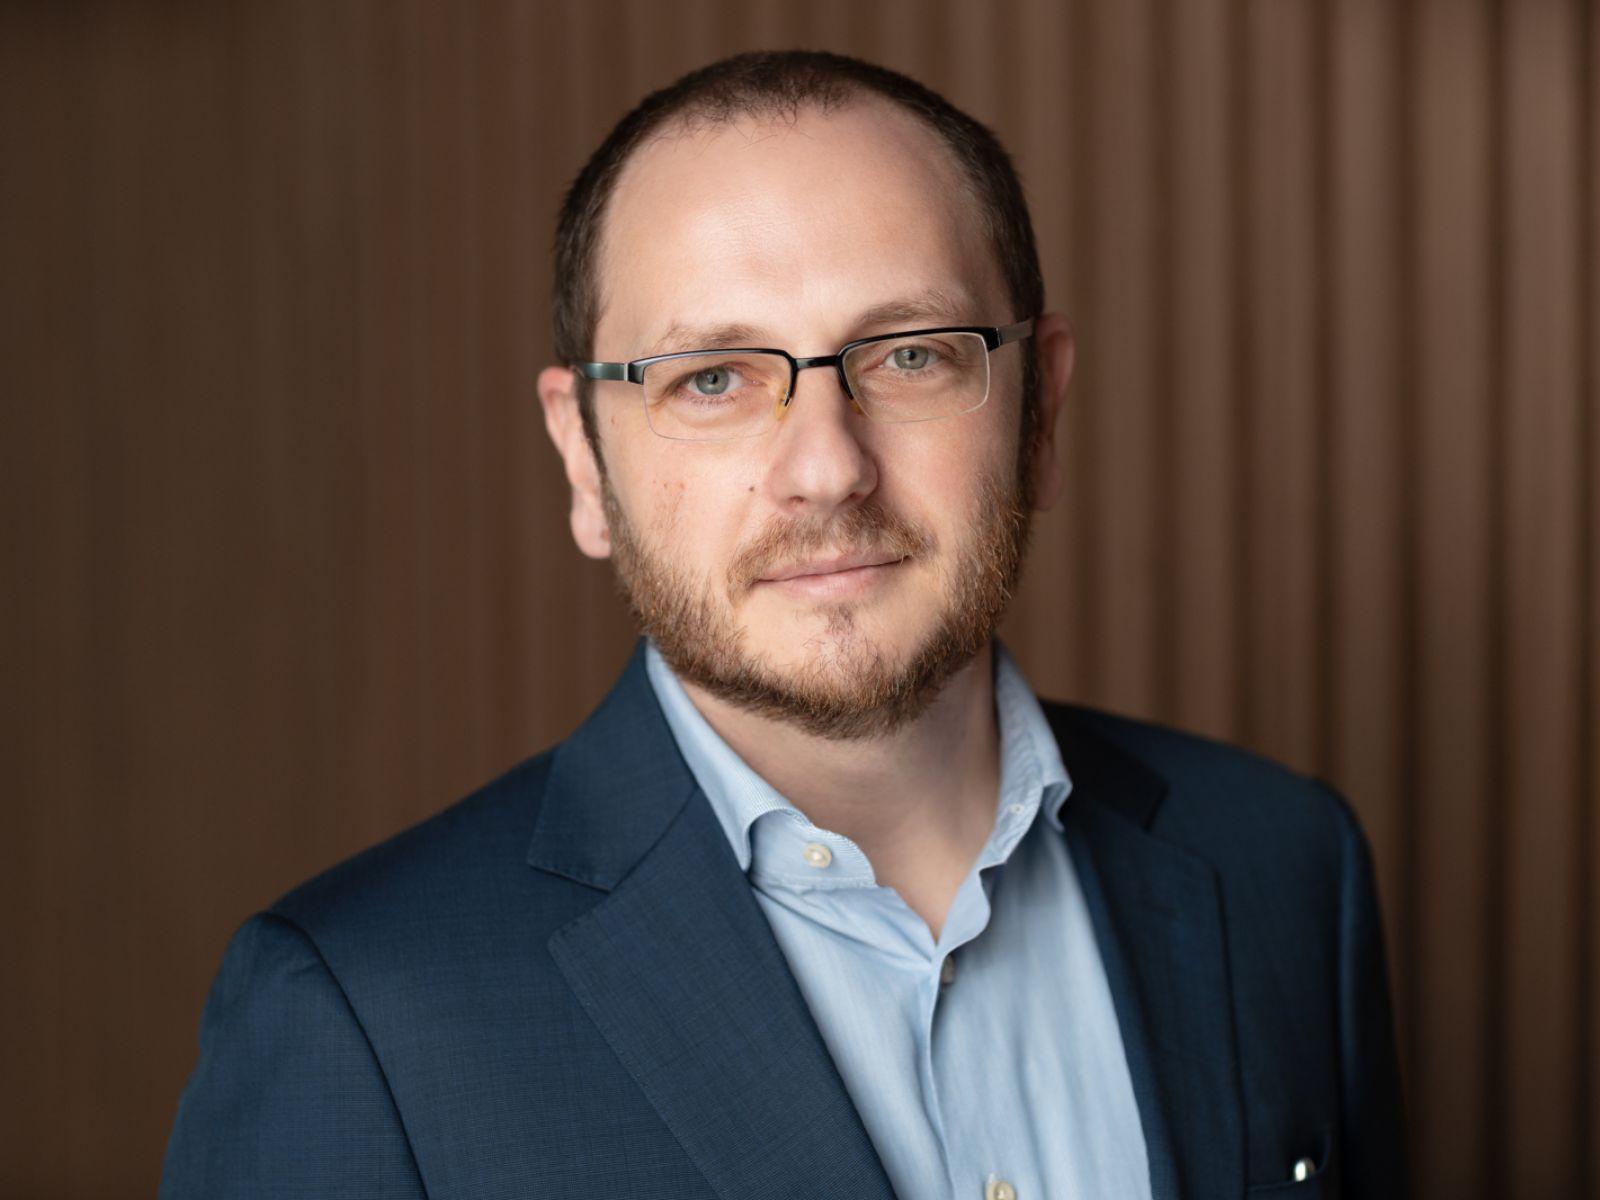 Alexandru Bîrsan, Partner of Filip & Company, on dual class shares for companies in Ziarul Financiar